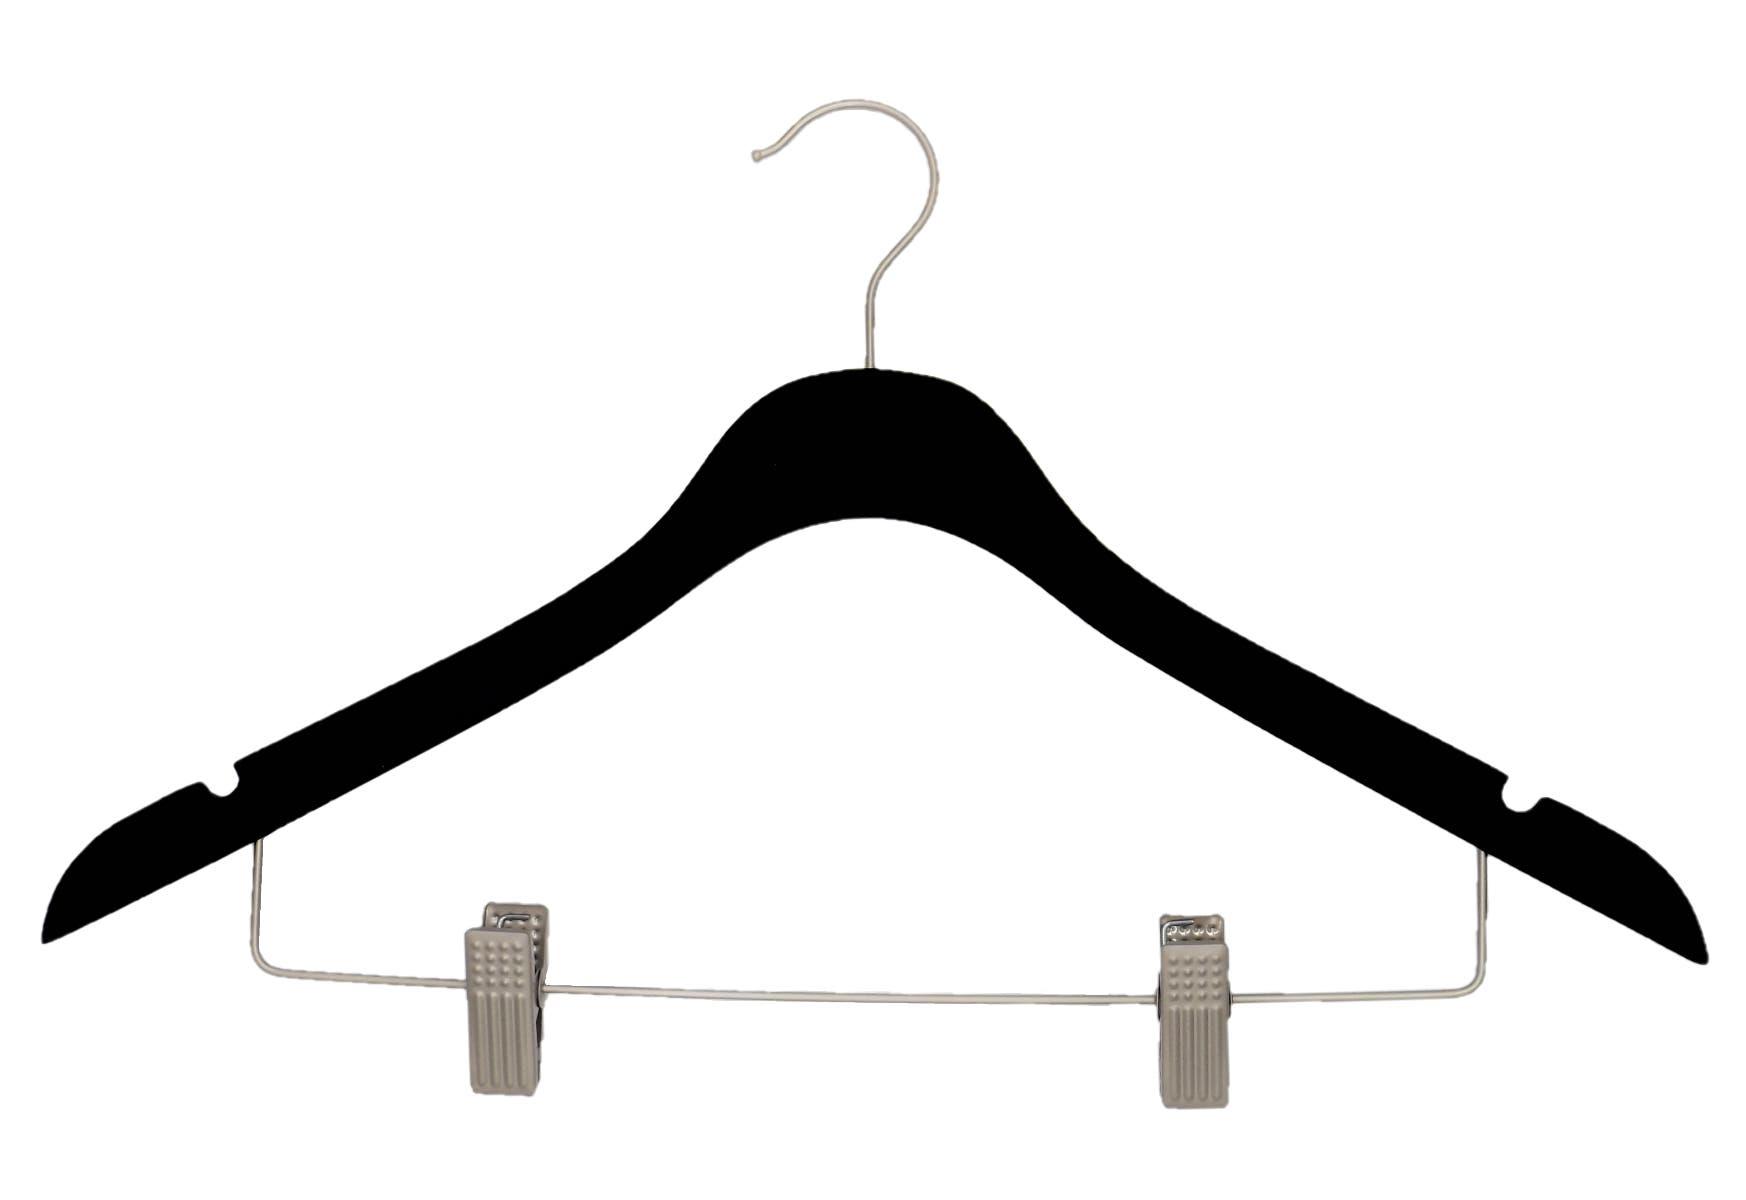 "17"" NAHANCO SlimLine Black Rubberized Wooden Suit Hanger with Chrome Clips, 25pk"